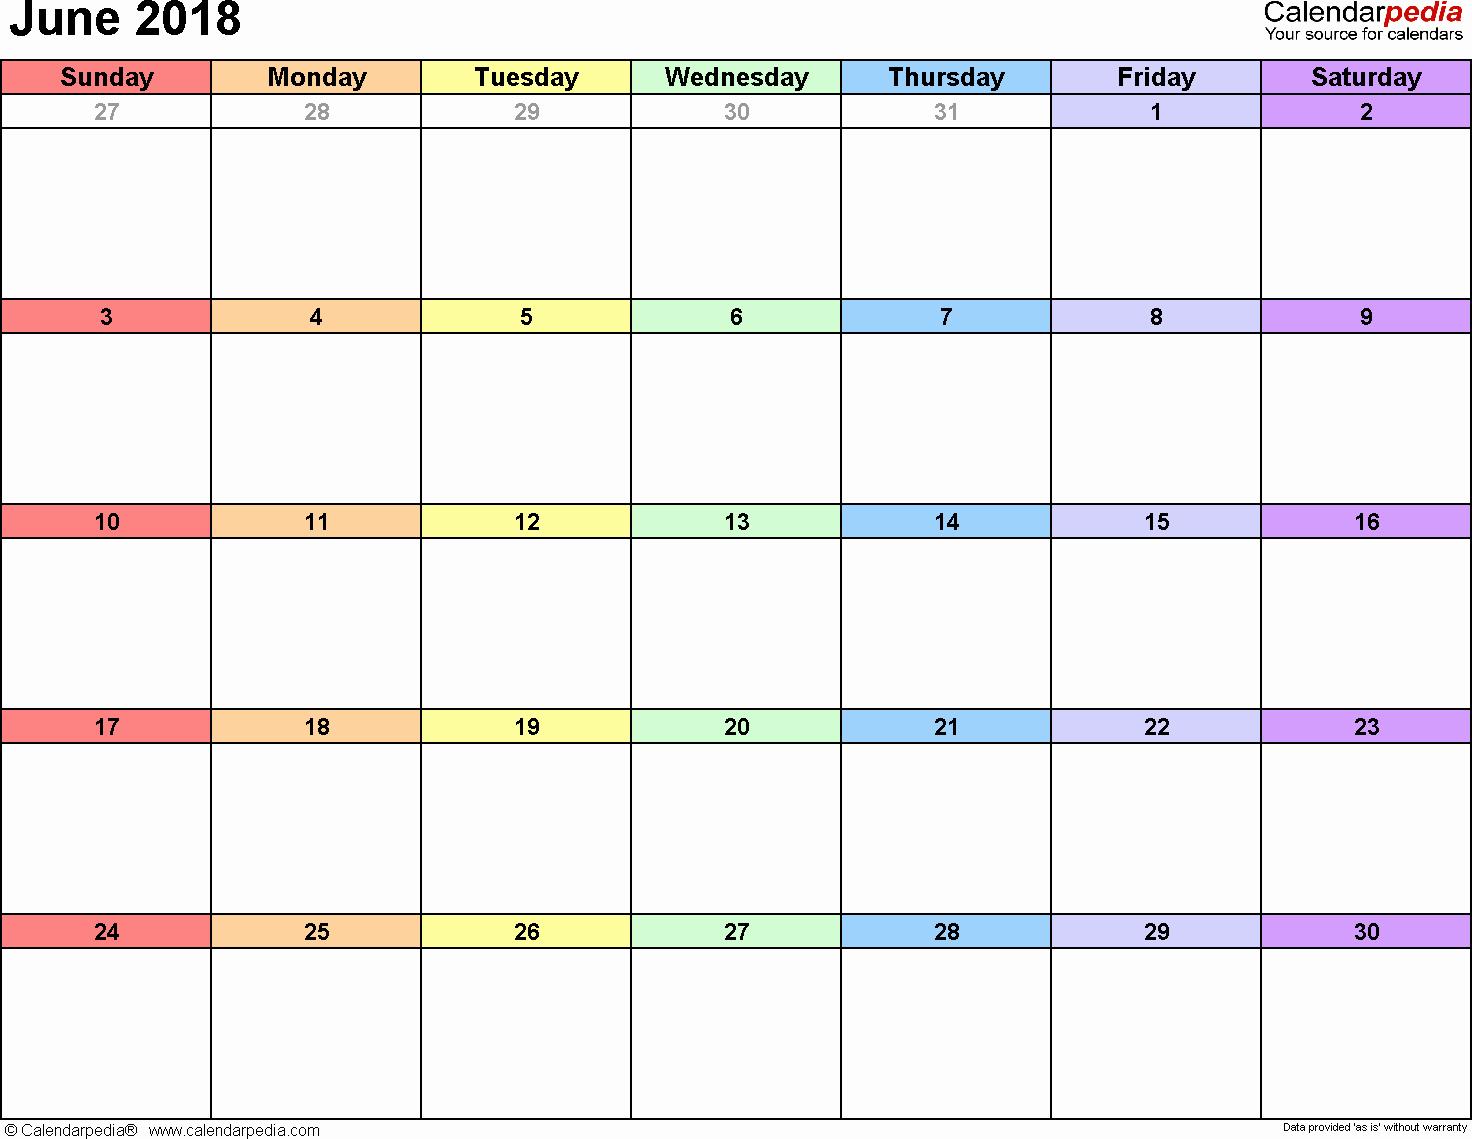 Microsoft Word Calendar Template 2018 Elegant June 2018 Calendar Word